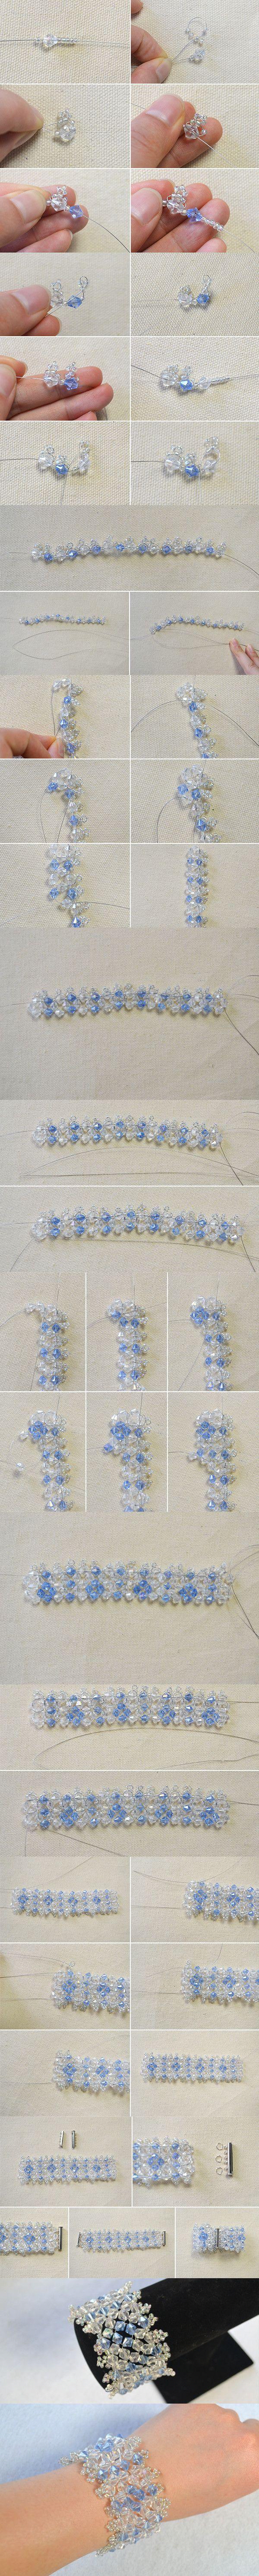 Beaded Bracelet Tutorial-How Do You Make a Crystal Beaded Bracelet from LC.Pandahall.com #pandahall